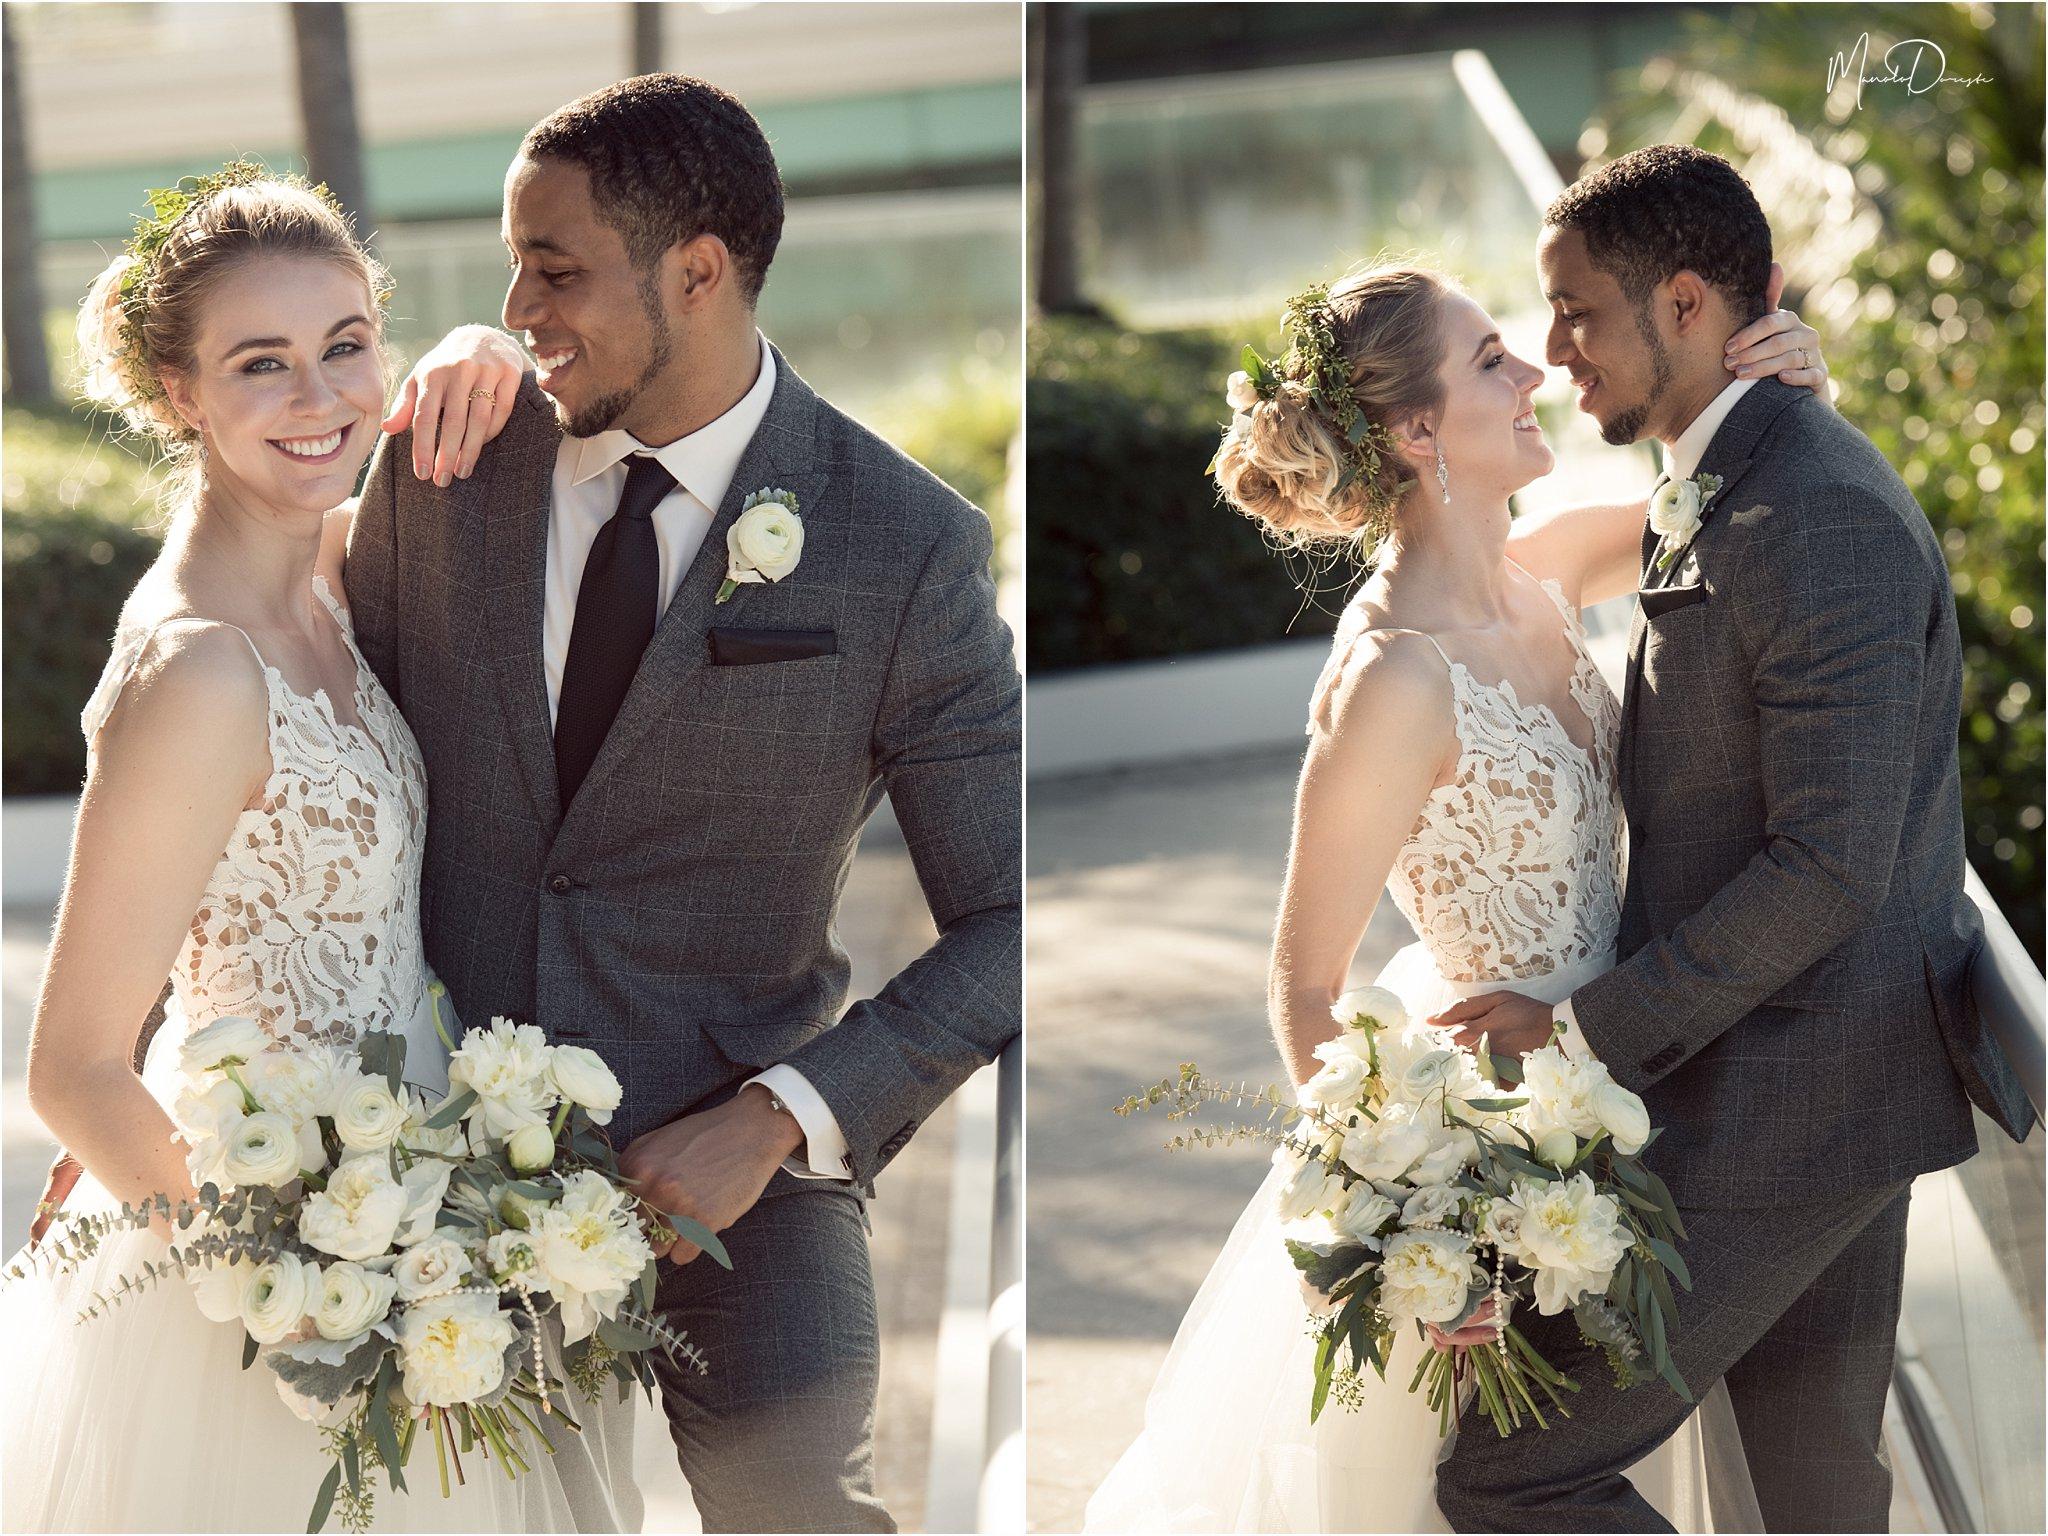 00881_ManoloDoreste_InFocusStudios_Wedding_Family_Photography_Miami_MiamiPhotographer.jpg